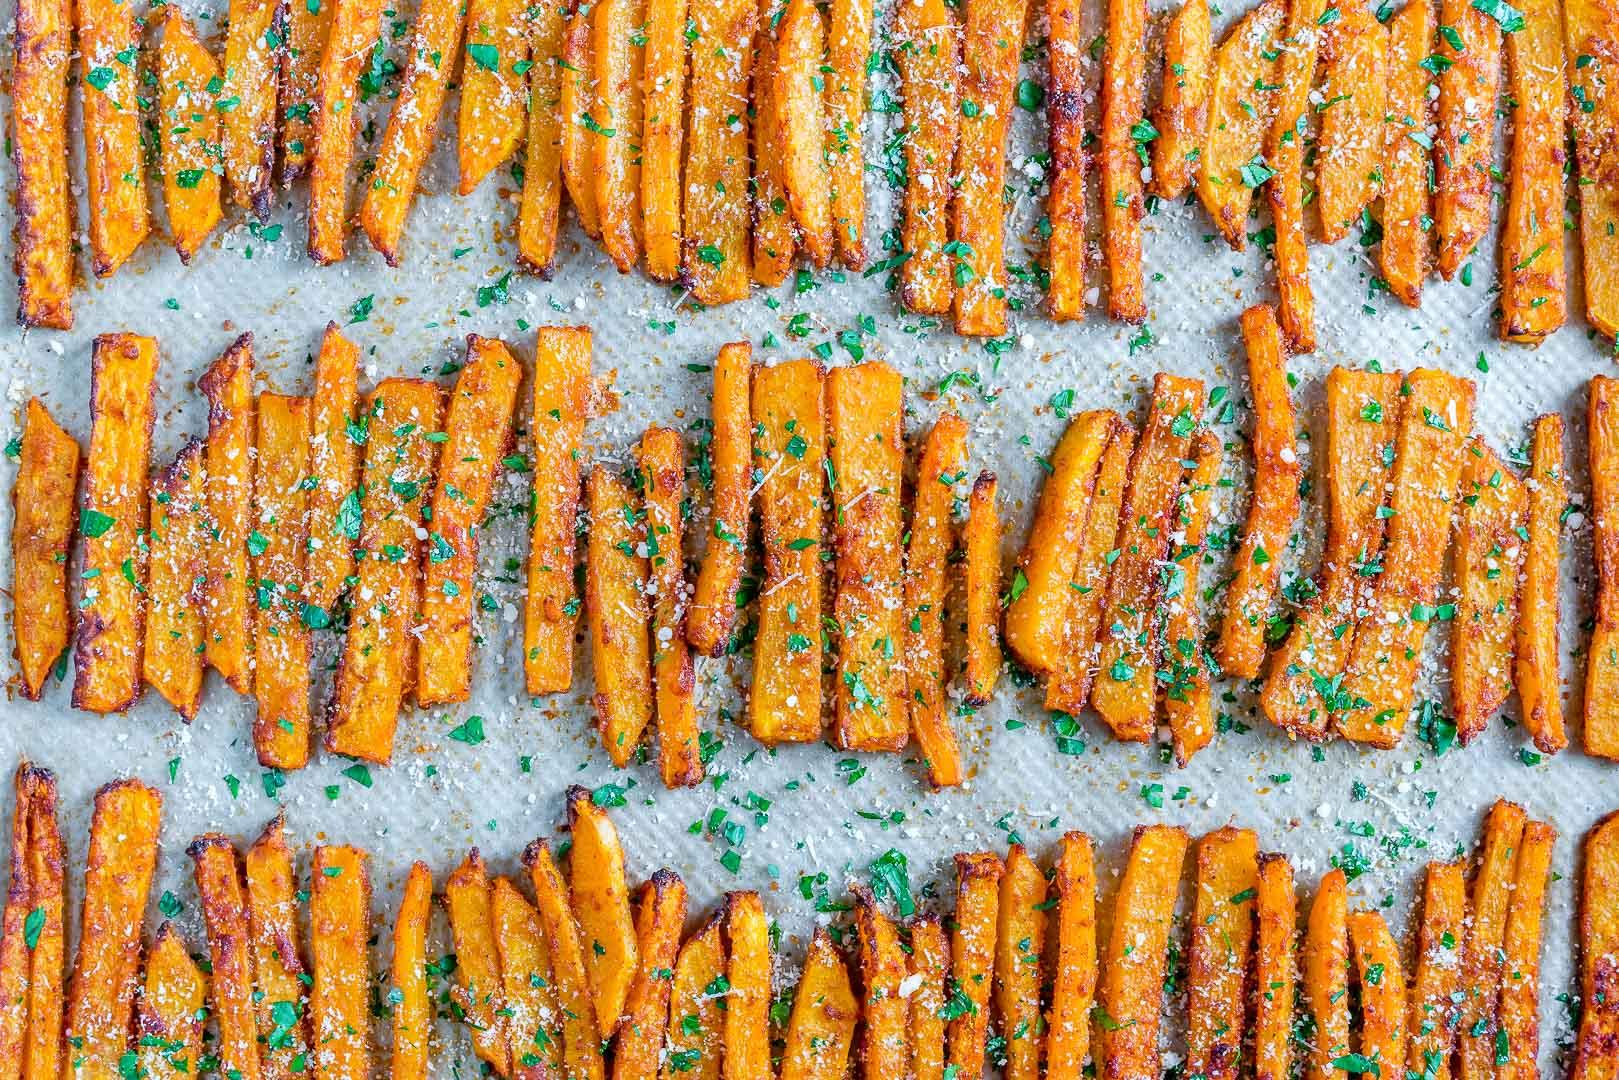 Baked Parmesan Butternut Squash Fries recipe